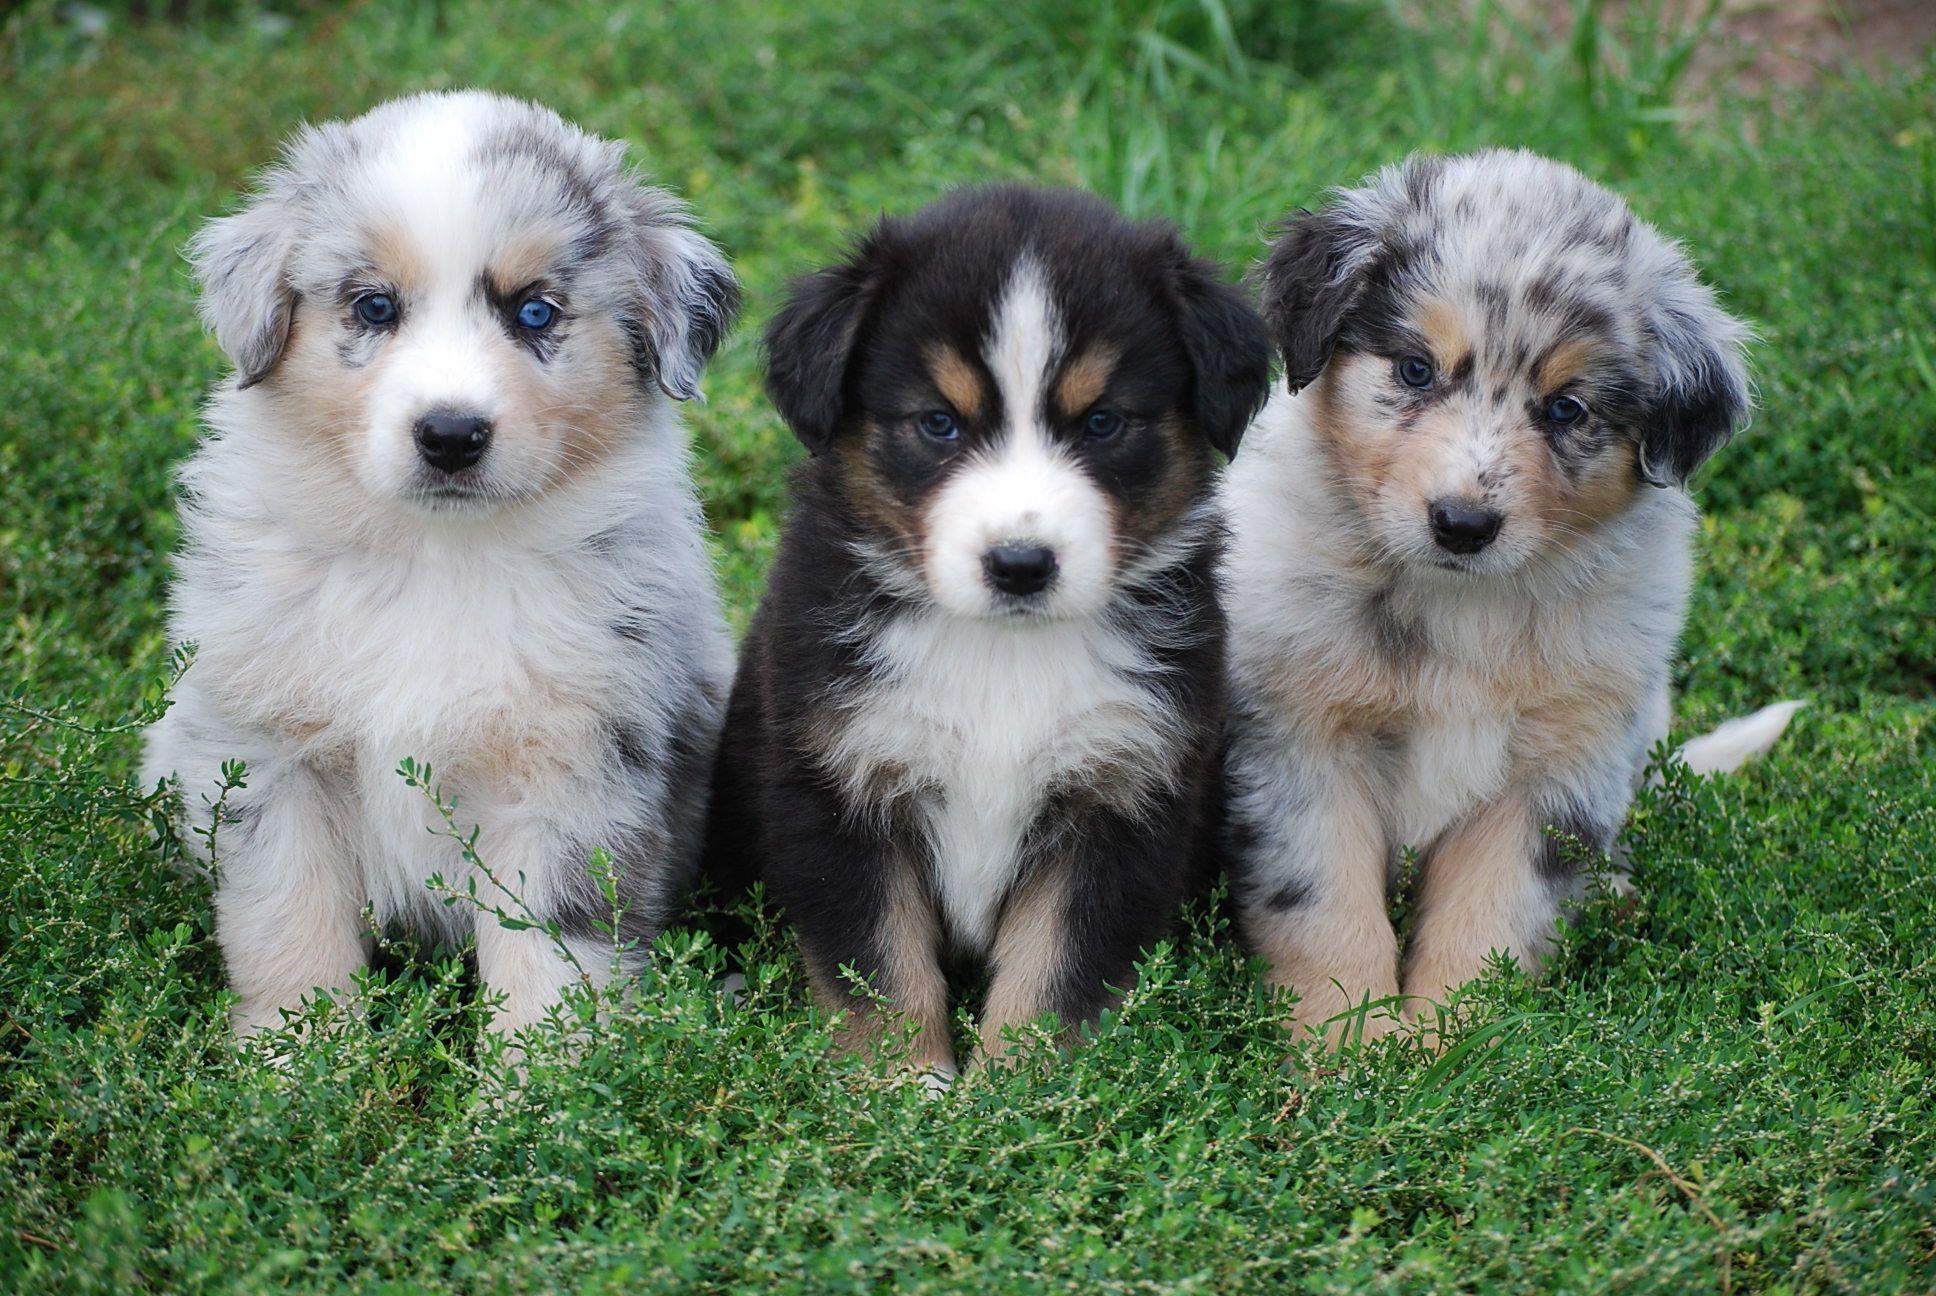 Australian Shepherd Dog Puppies Australian Shepherd Dogs Australian Shepherd Puppies Cute Dogs And Puppies